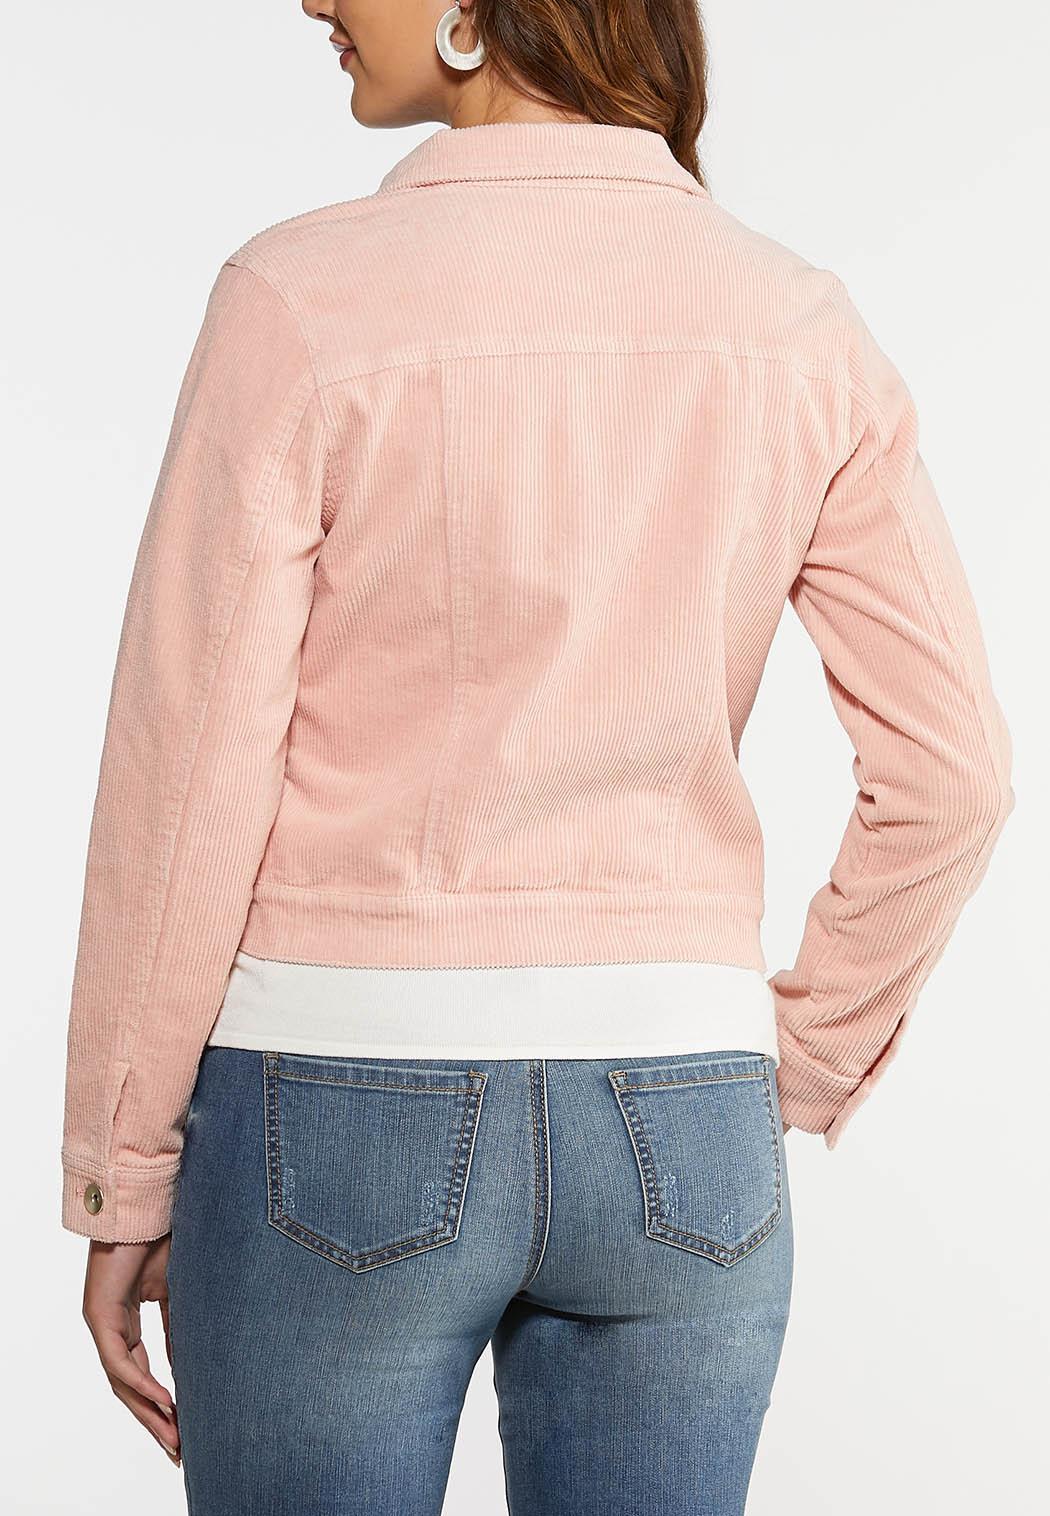 Plus Size Pink Corduroy Jacket (Item #43997365)